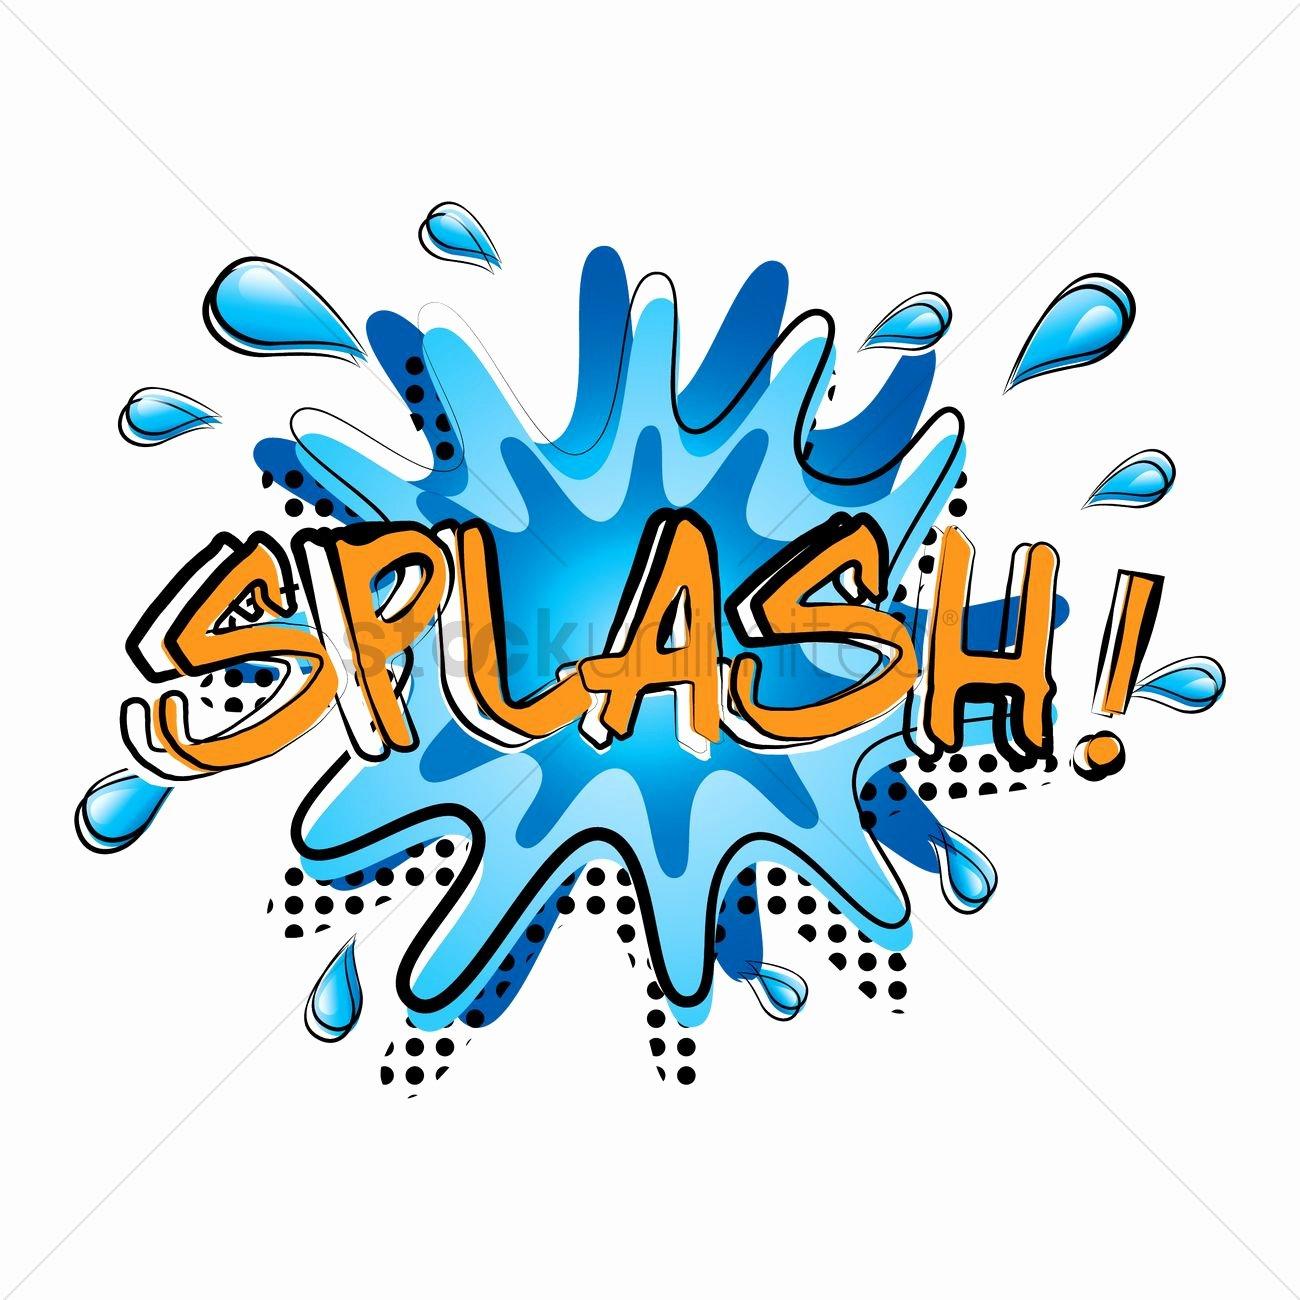 Ic Word Splash Vector Image